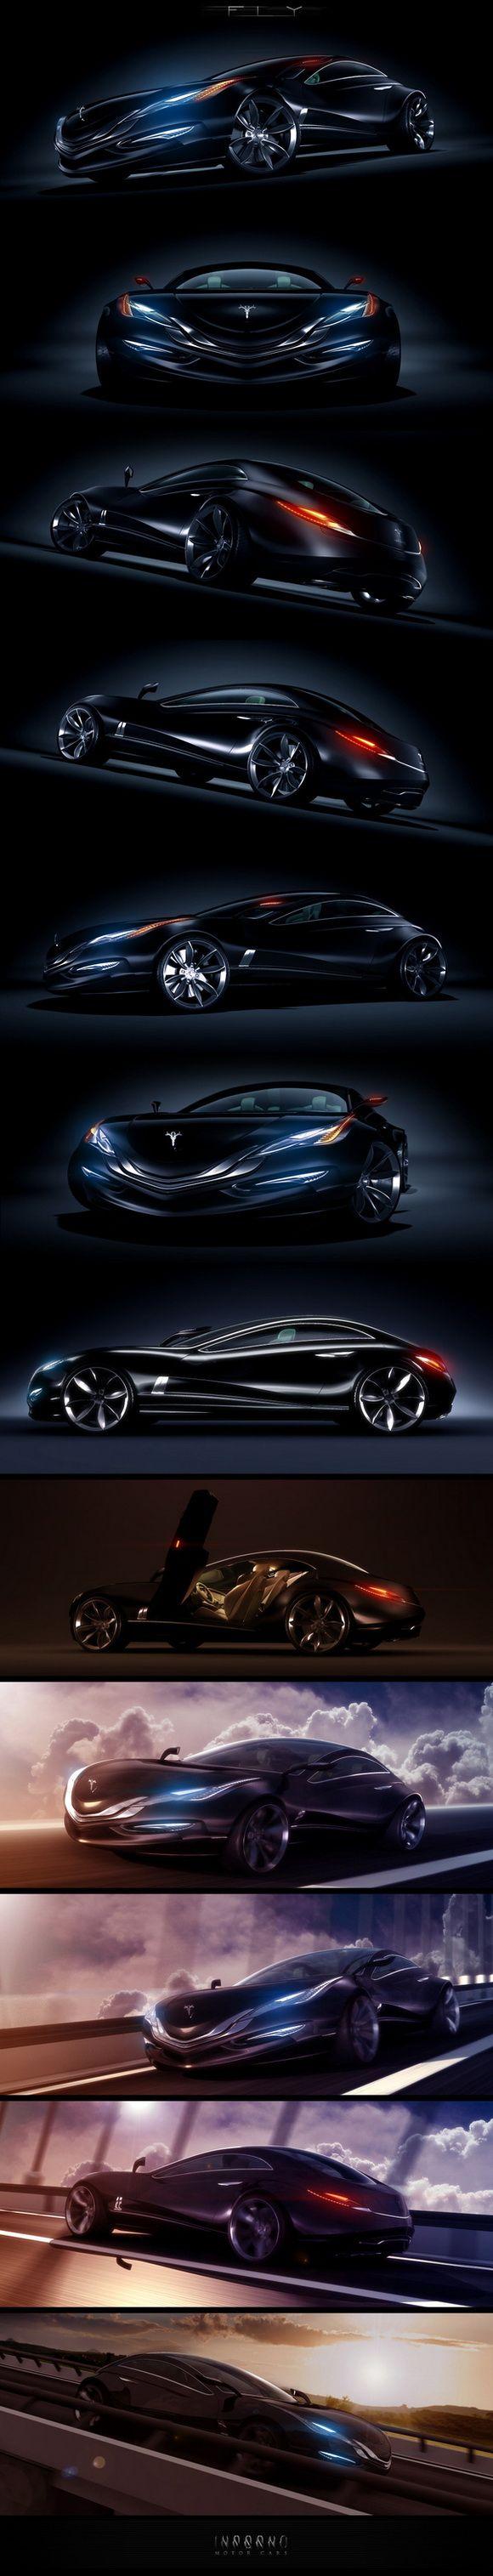 Awesome Car Concept Graphic Design Pinterest Concept Cars